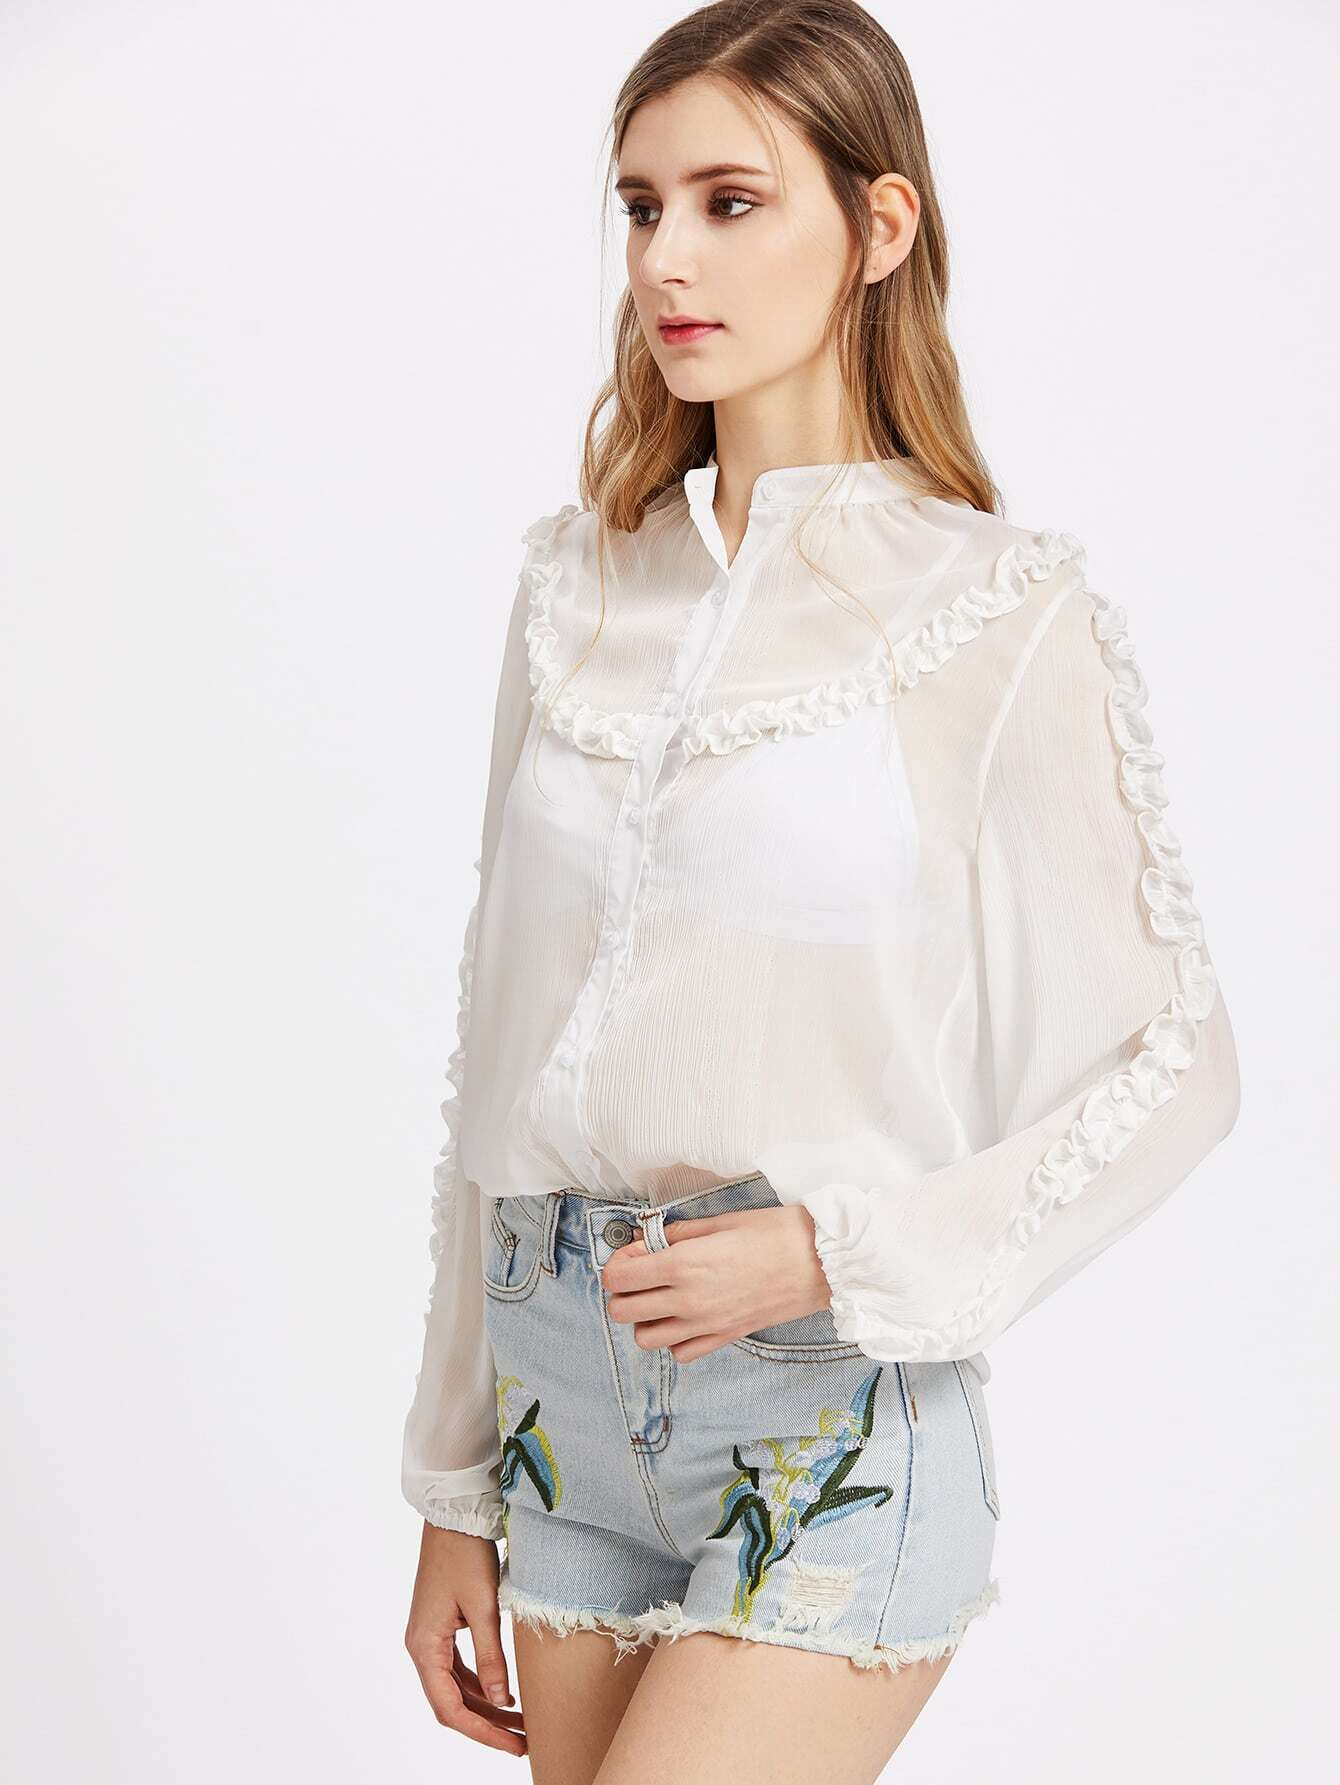 blouse170406457_2